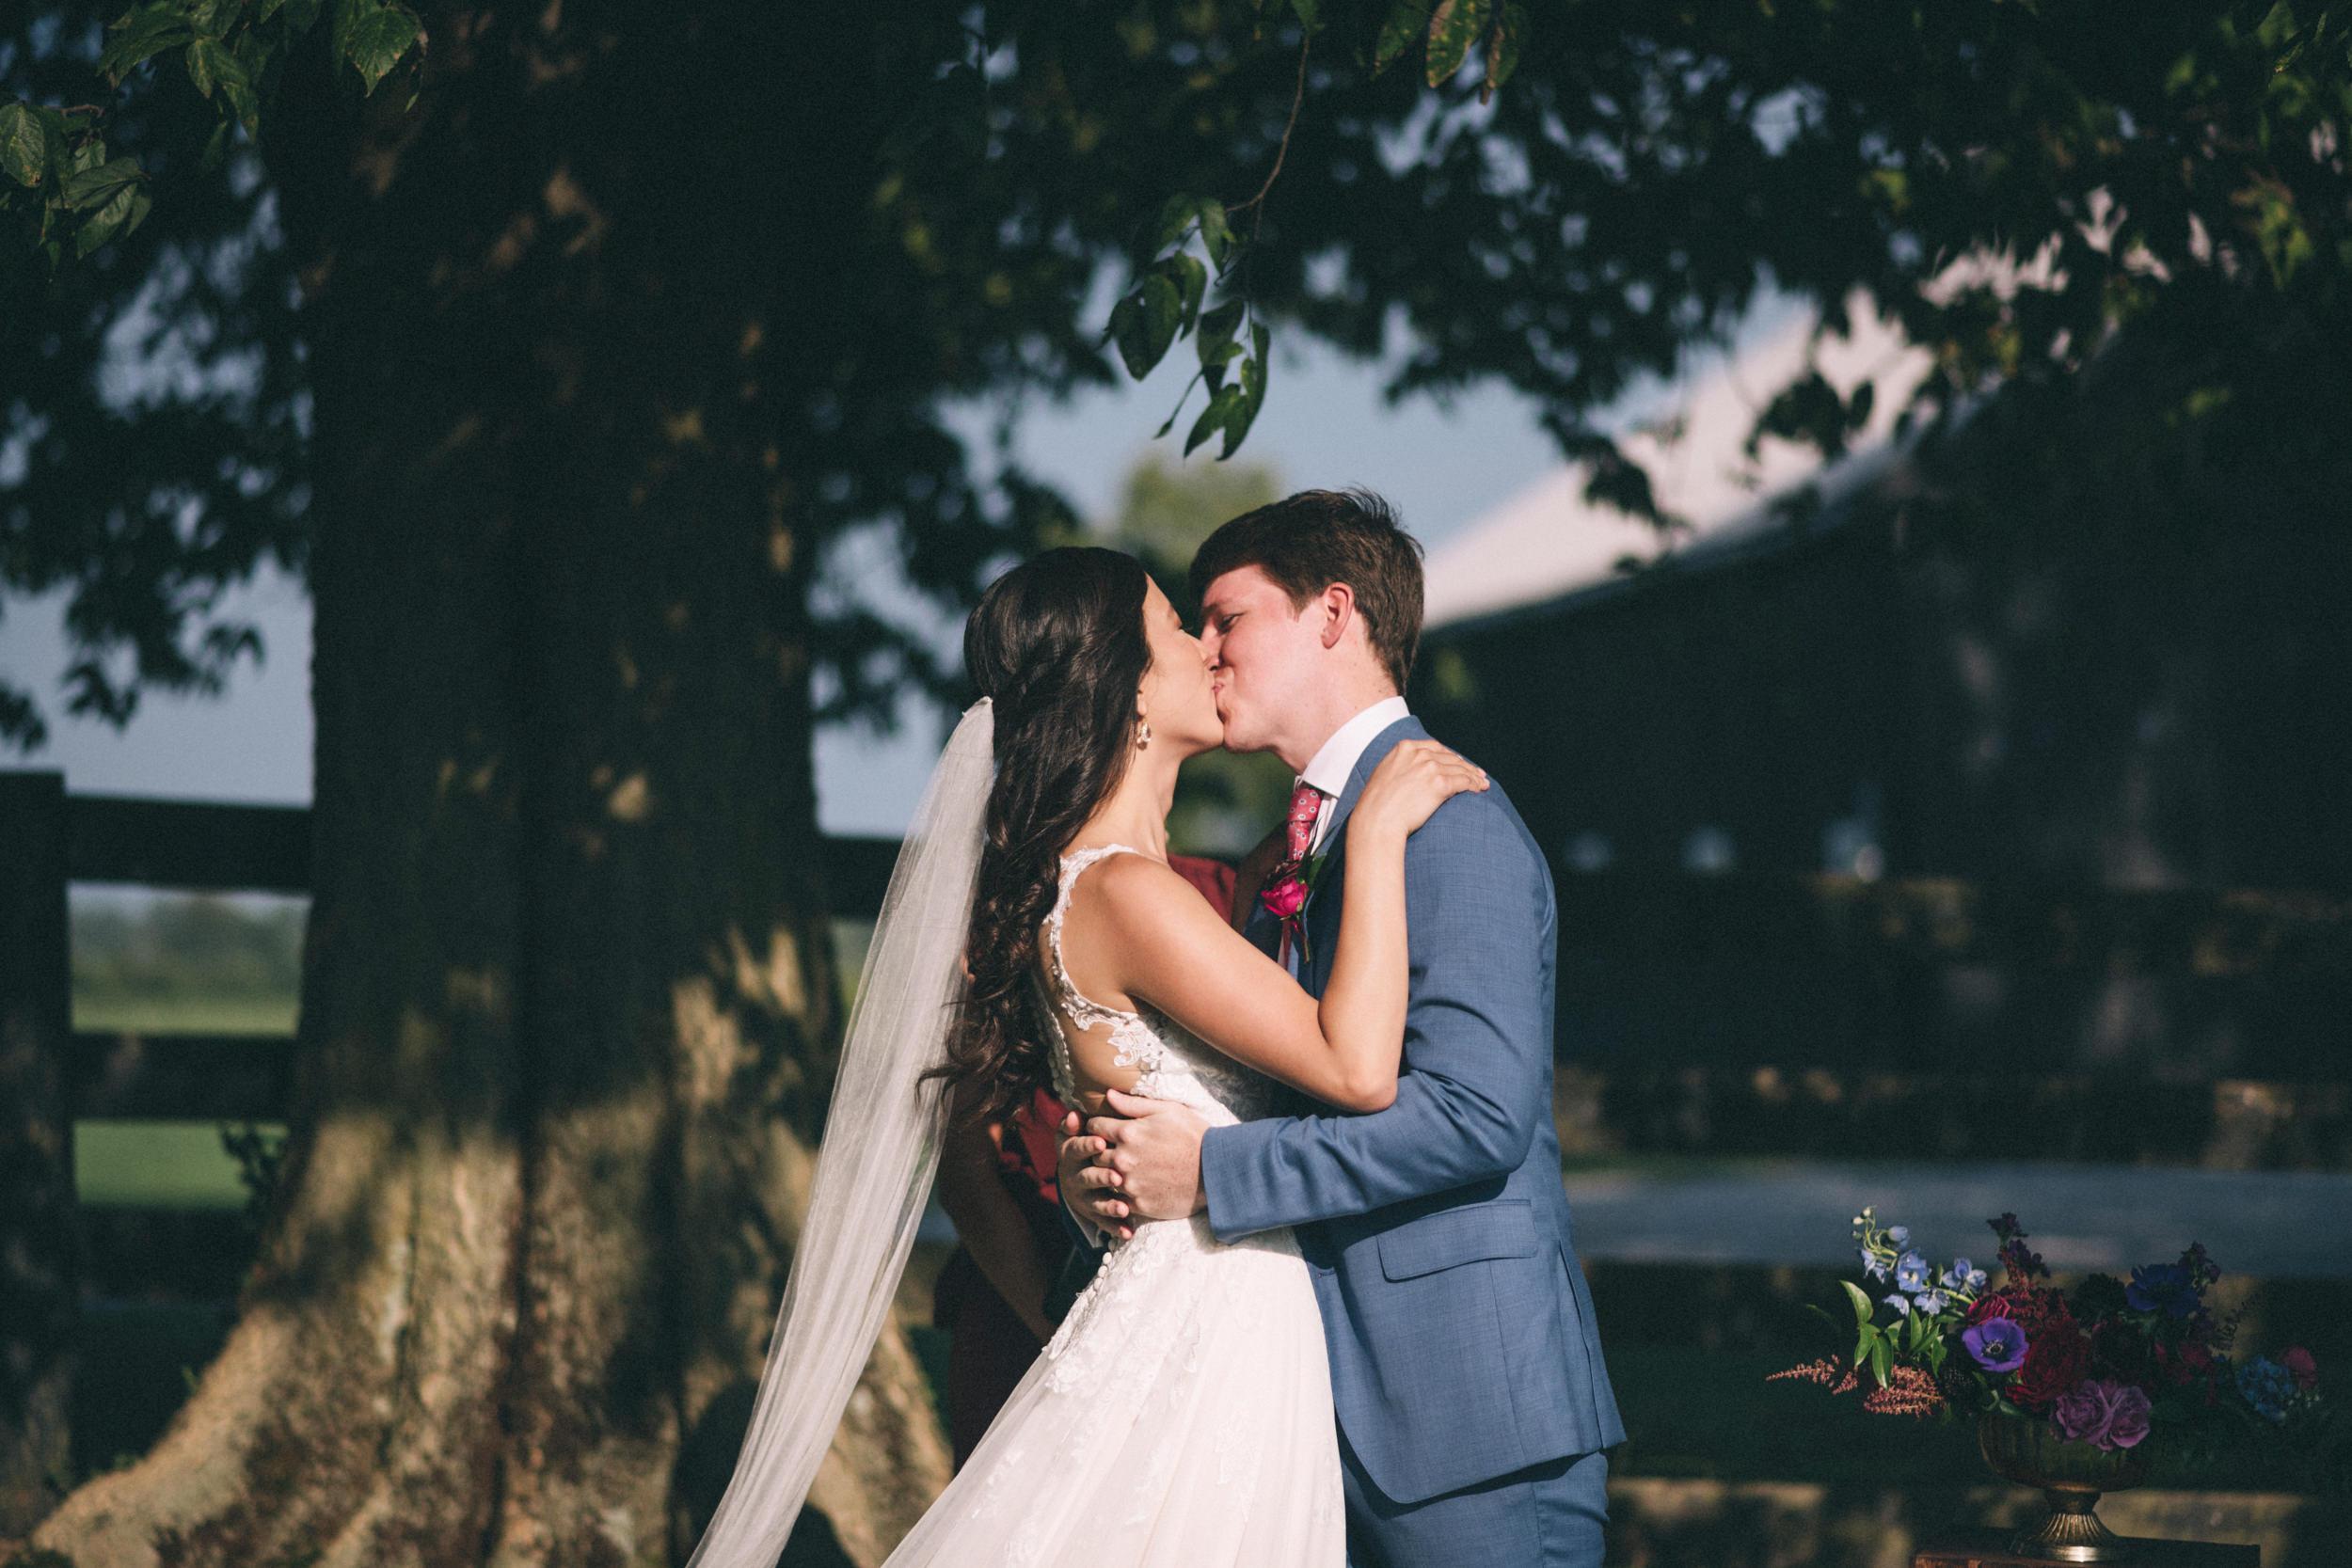 Louisville-Kentucky-Wedding-and-Elopement-Photographer-Sarah-Katherine-Davis-Photography-Summer-Jewel-Toned-Wedding-Chineese-Tea-Ceremony-Warrenwood-Manor-Danville-590.jpg